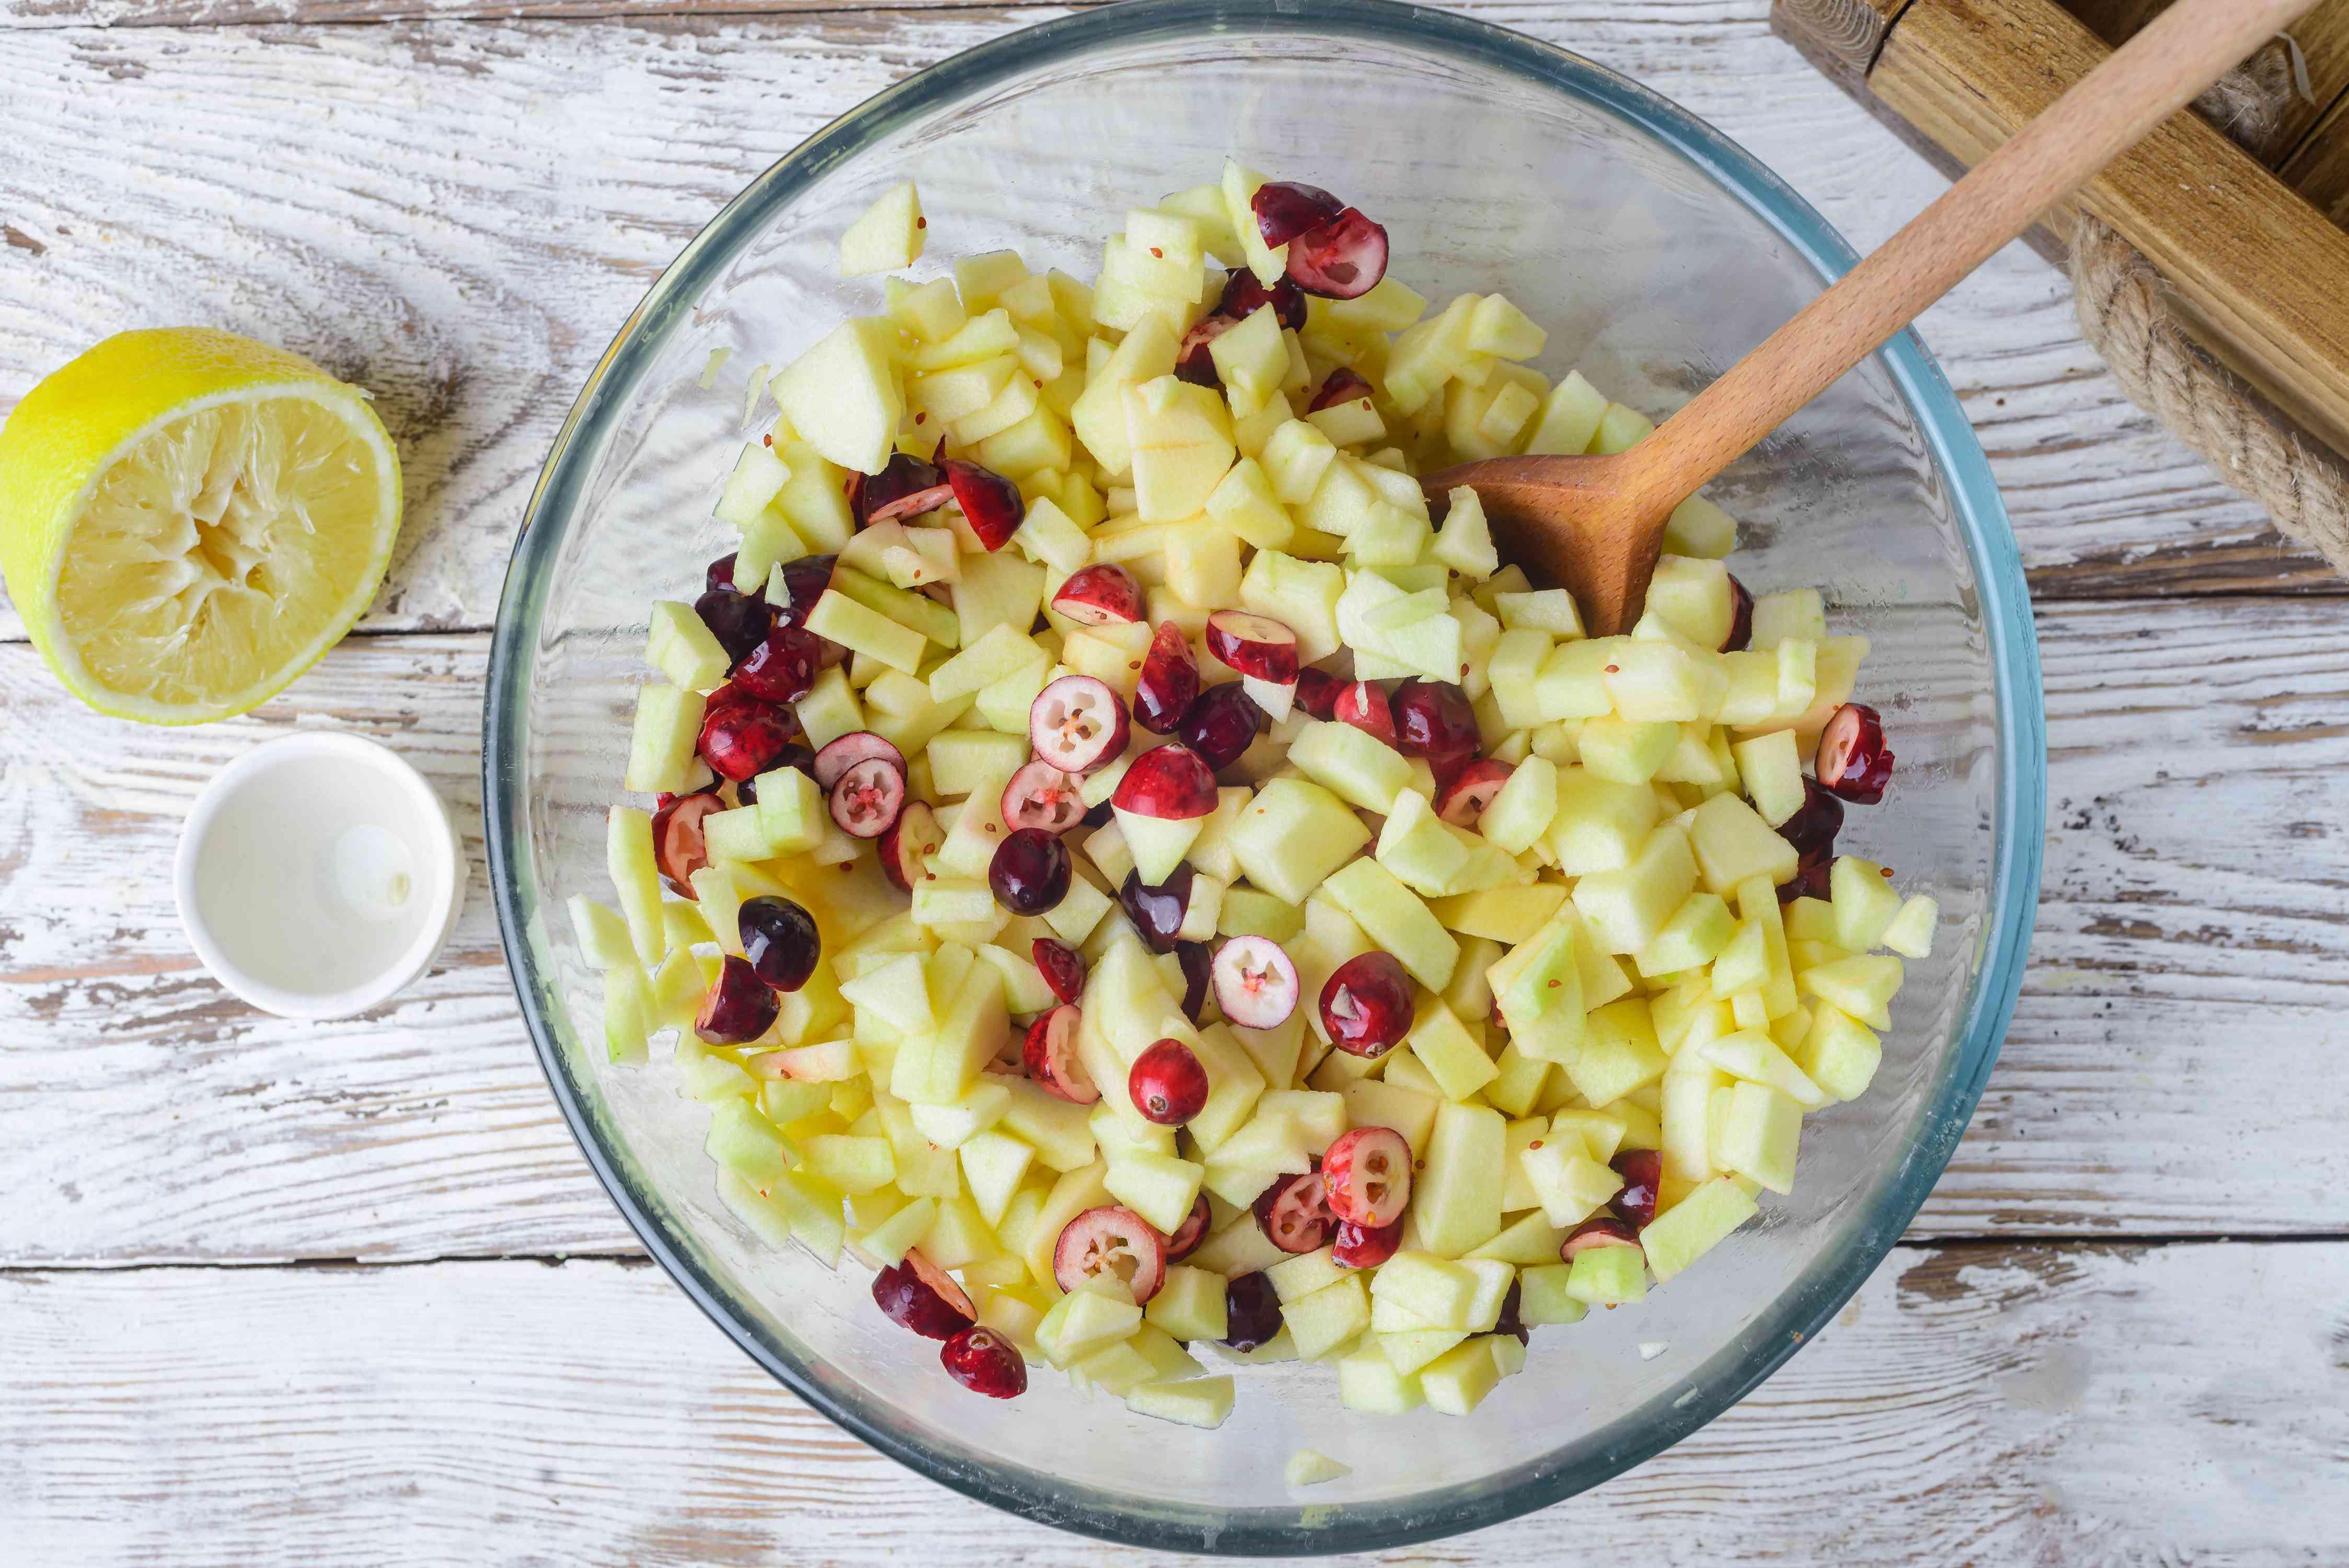 Add apples